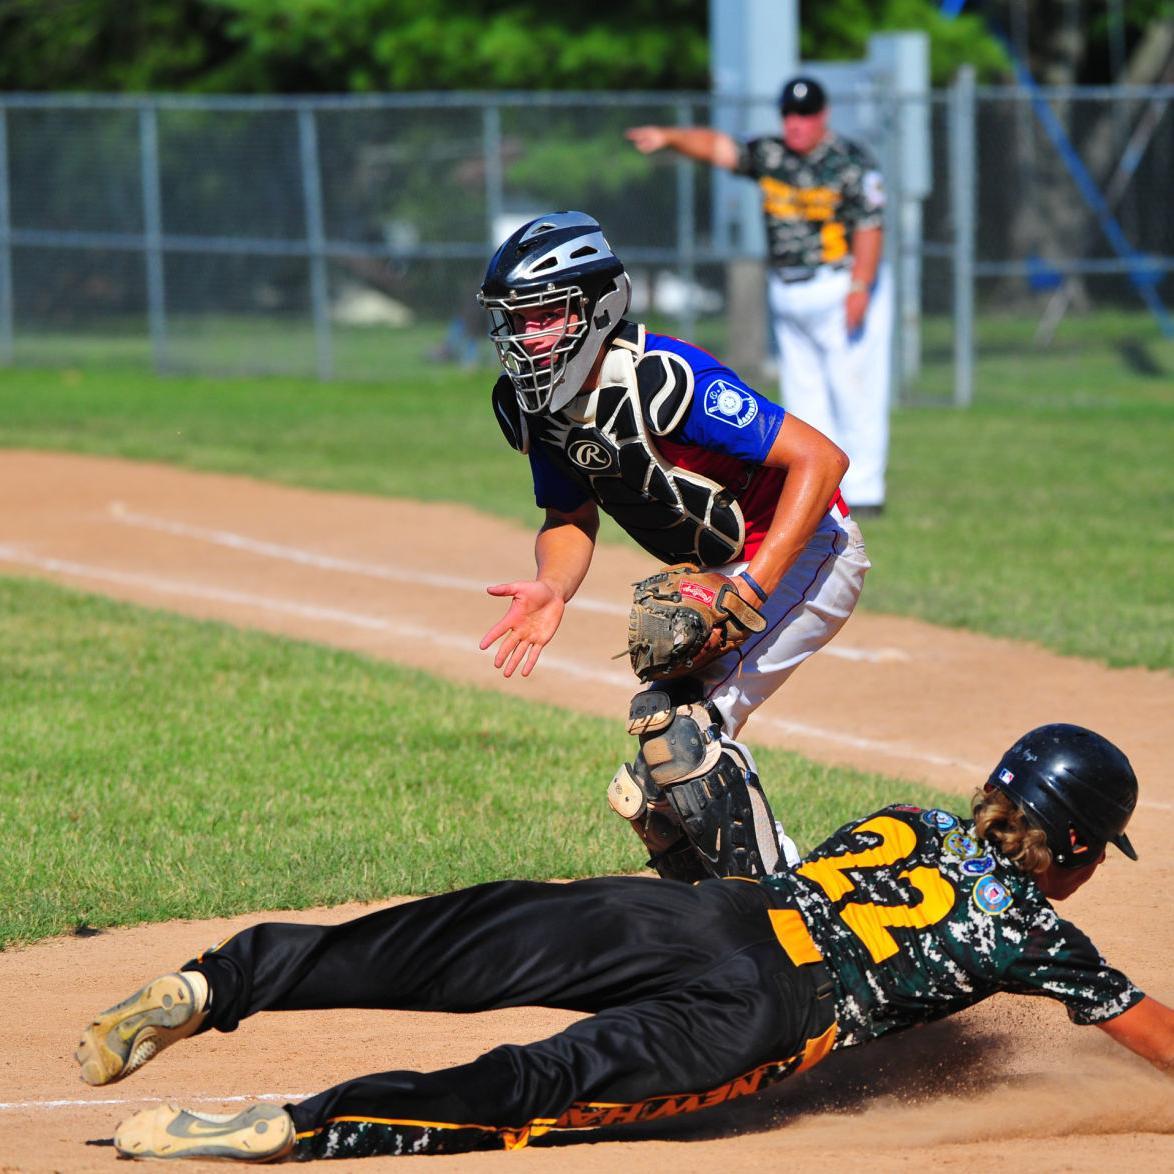 Junior Legion —New Haven Post 366 vs. Washington Post 218, Championship Series Game 2